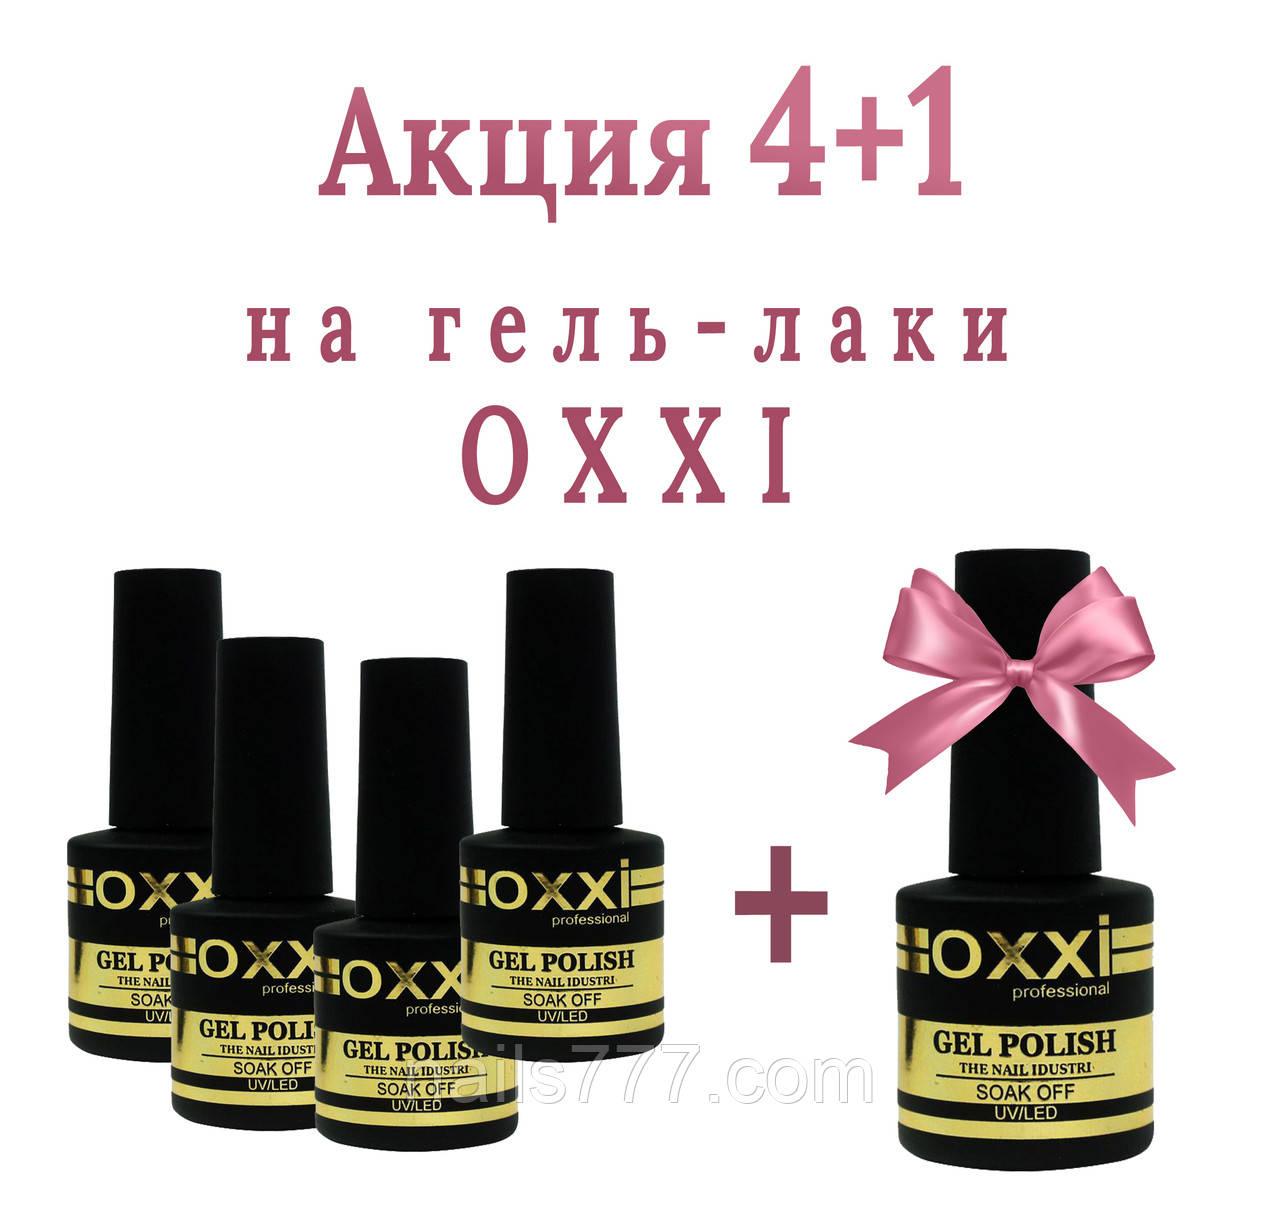 Акция 4+1 на гель-лаки OXXI